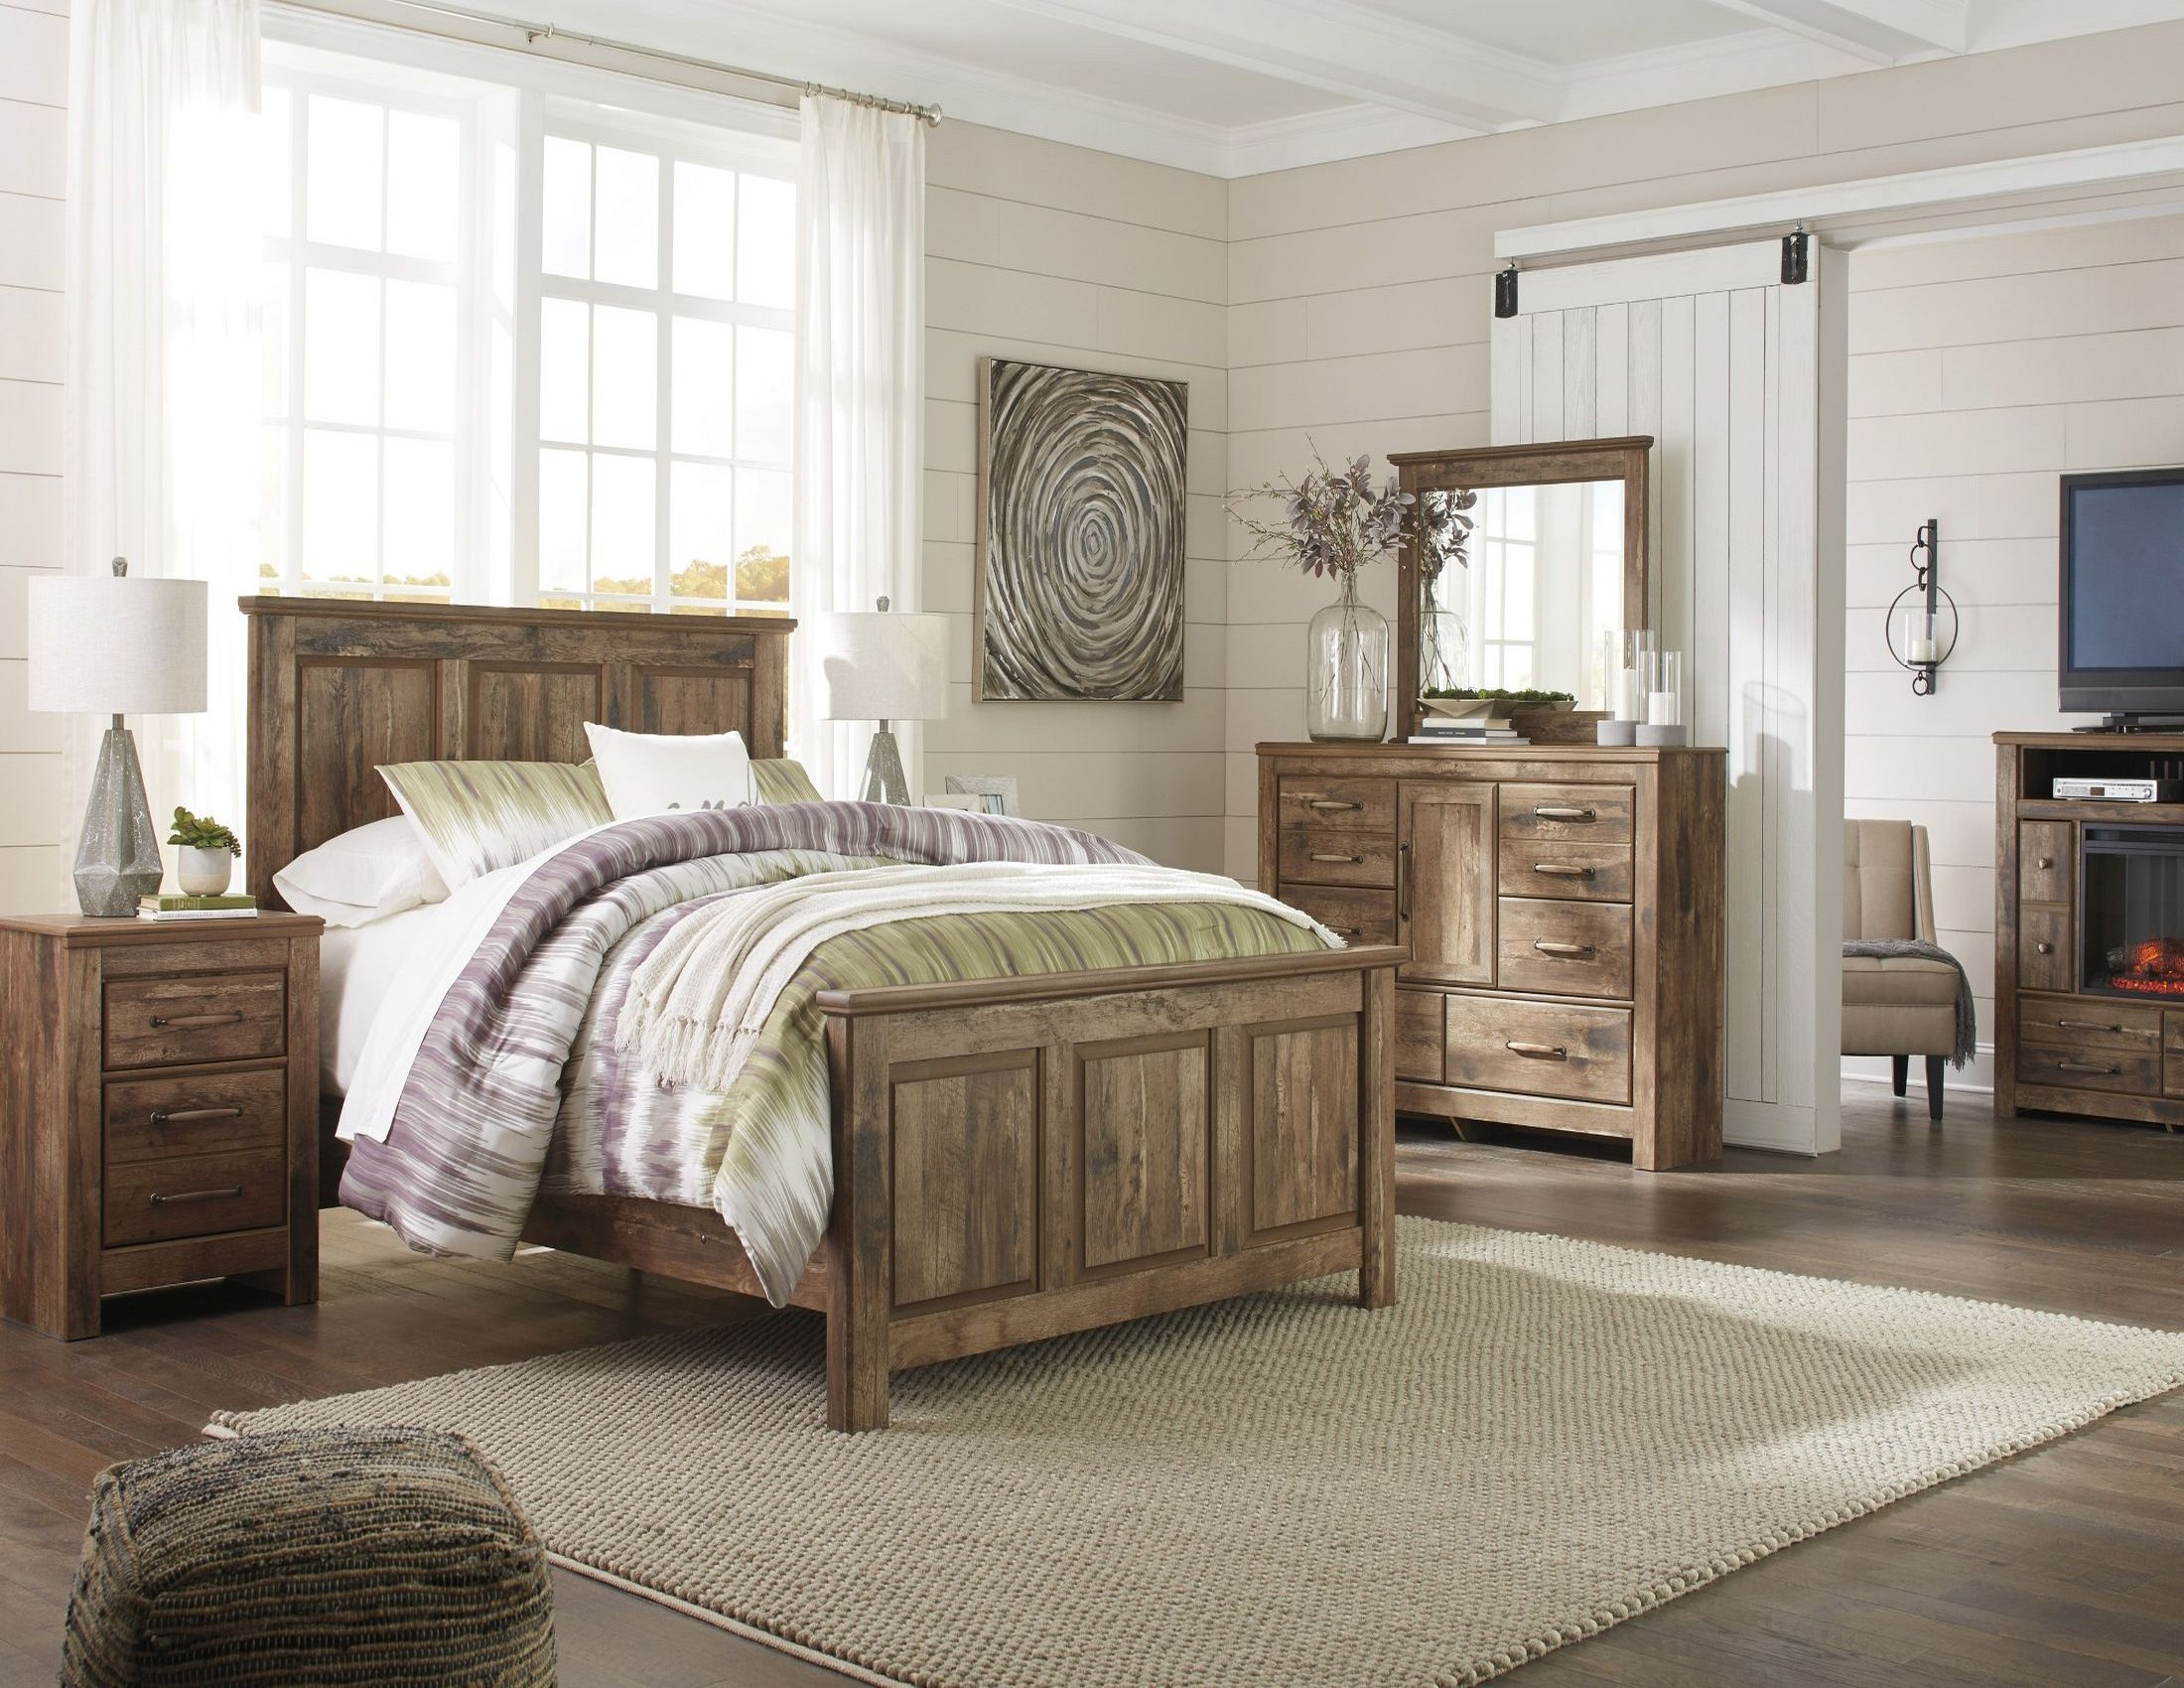 Discount King Bedroom Sets Blaneville Brown Panel Bedroom Set From Ashley Coleman